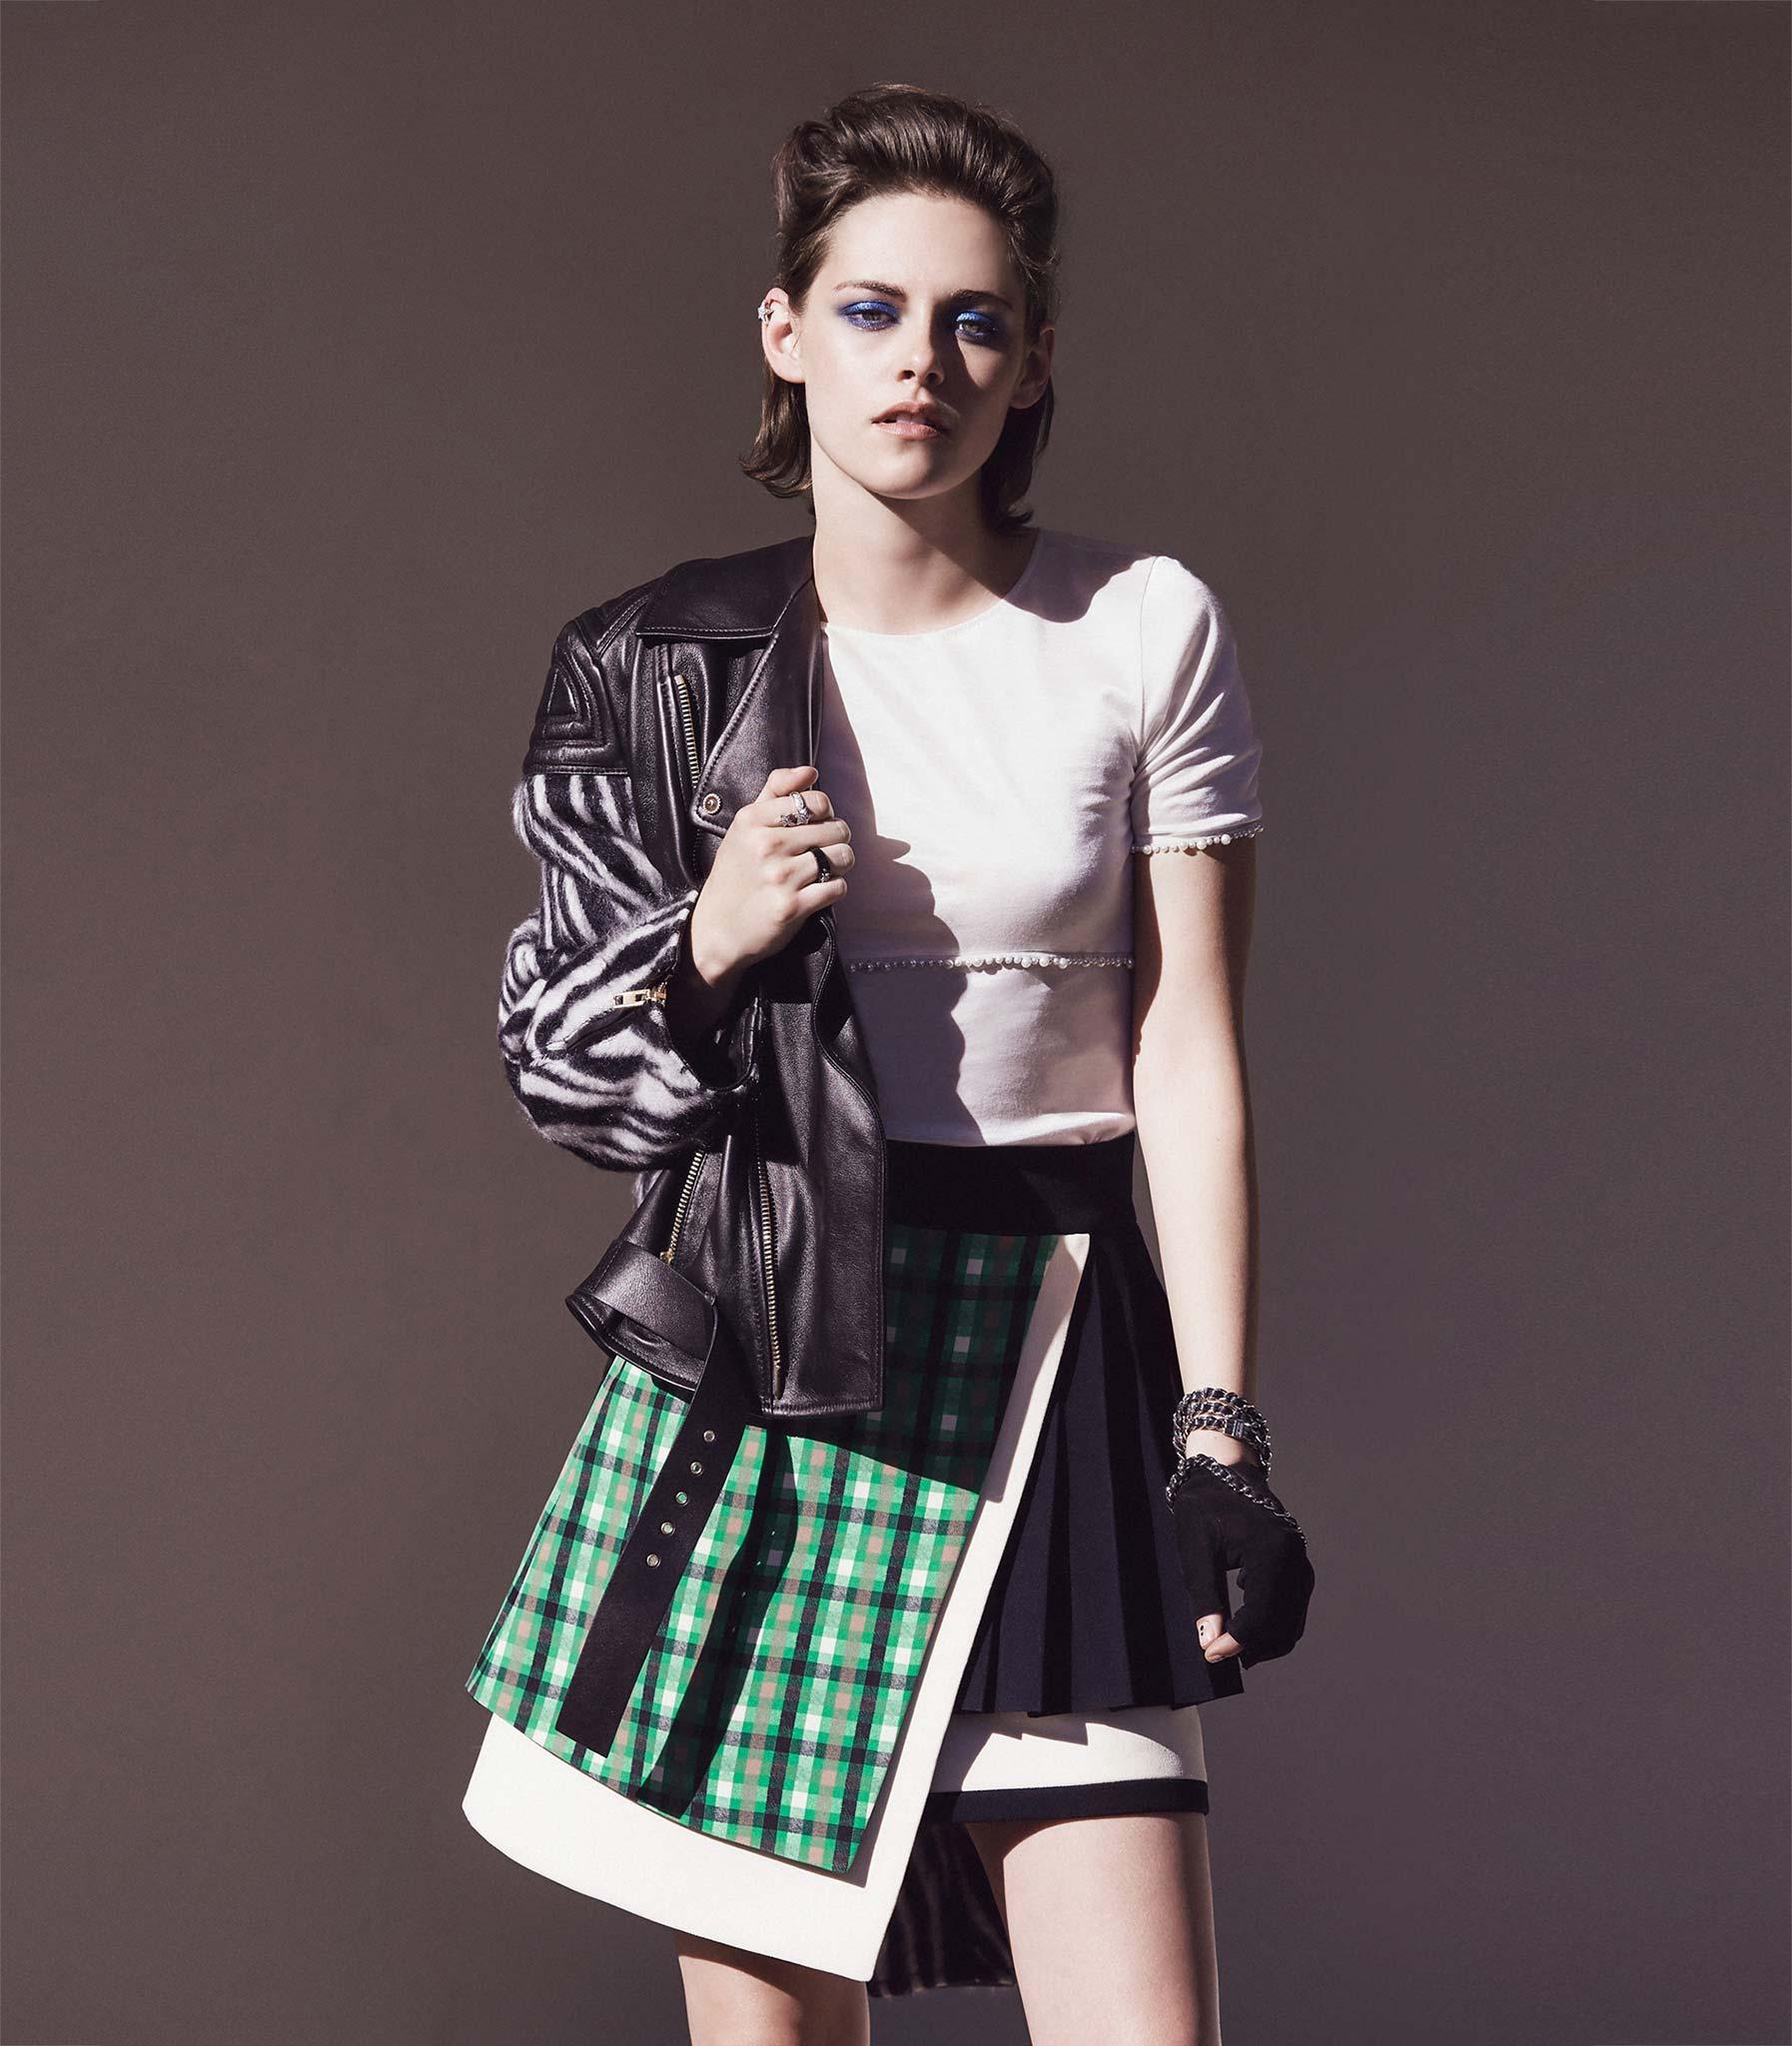 Kristen Stewart photoshoot for Nylon Magazine